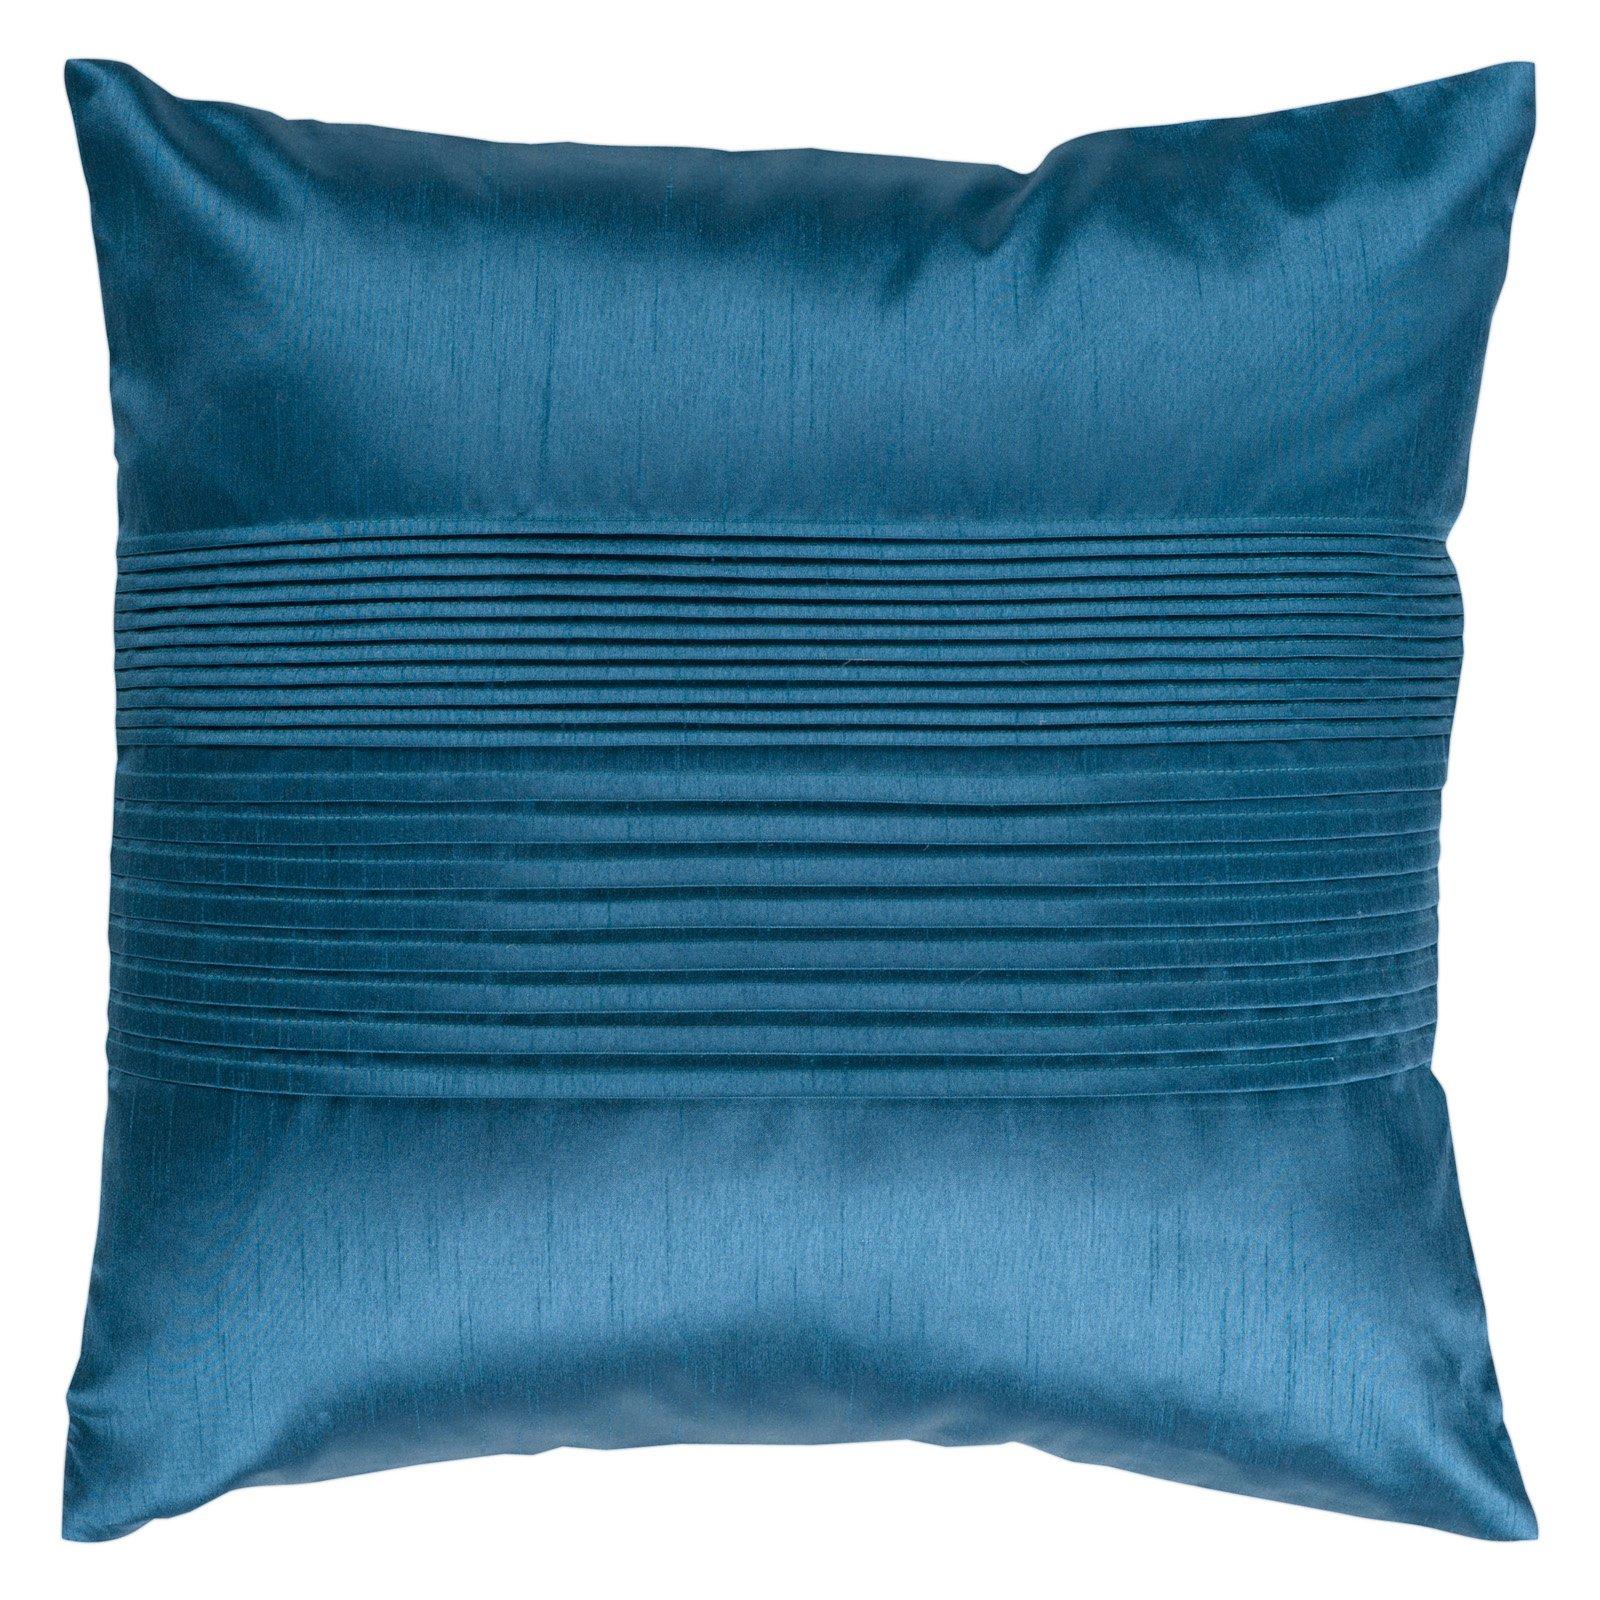 Surya Tracks Decorative Pillow - Teal Blue